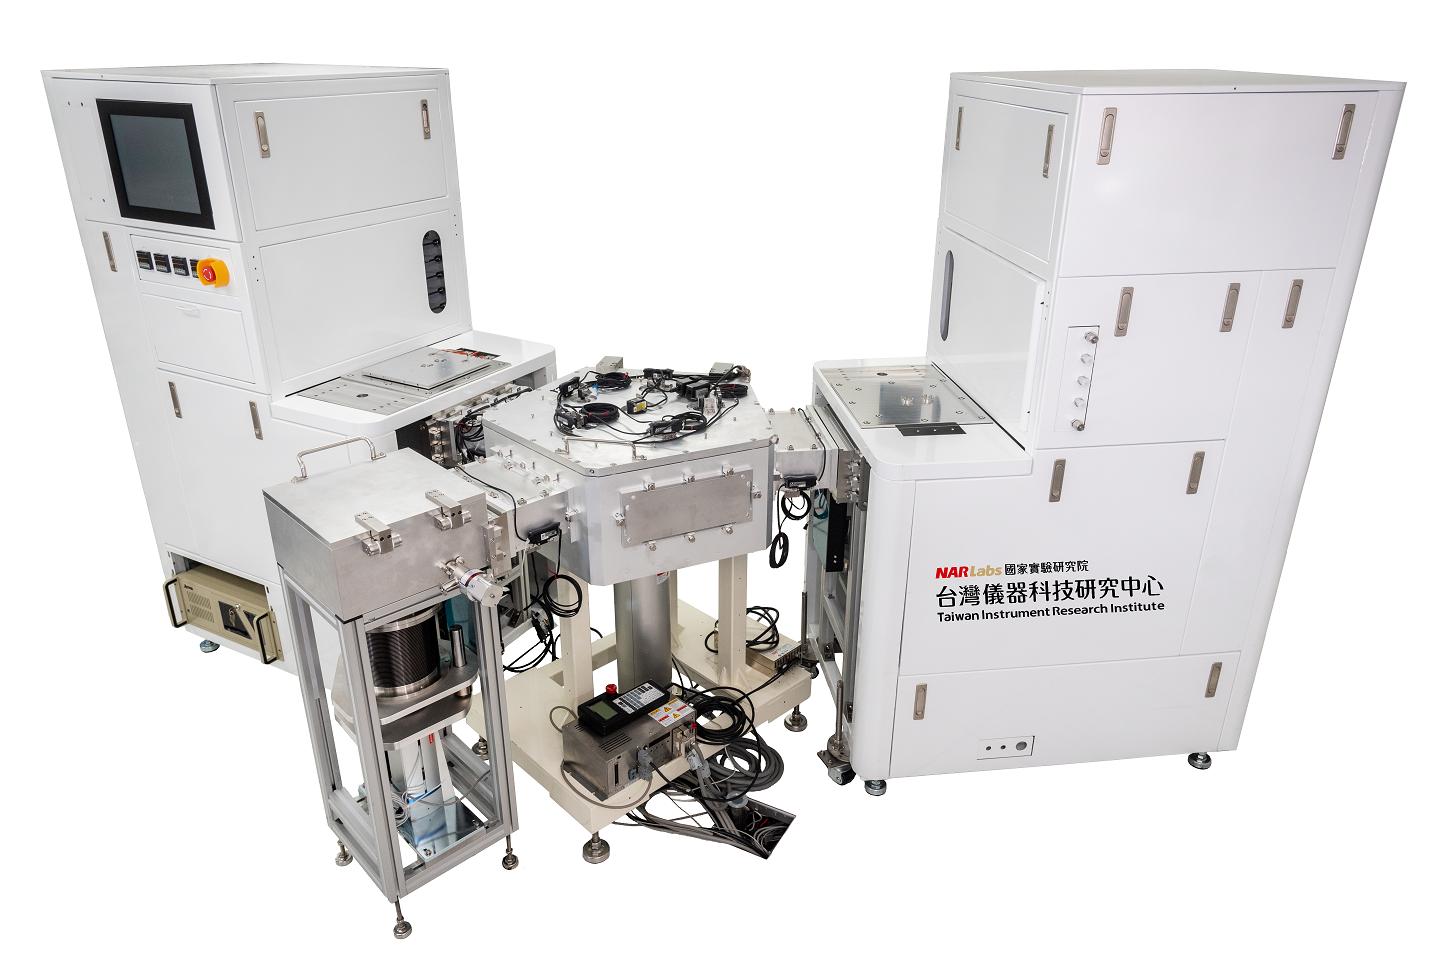 TIRI unveils 12-inch Cluster ALD Advanced Equipment.